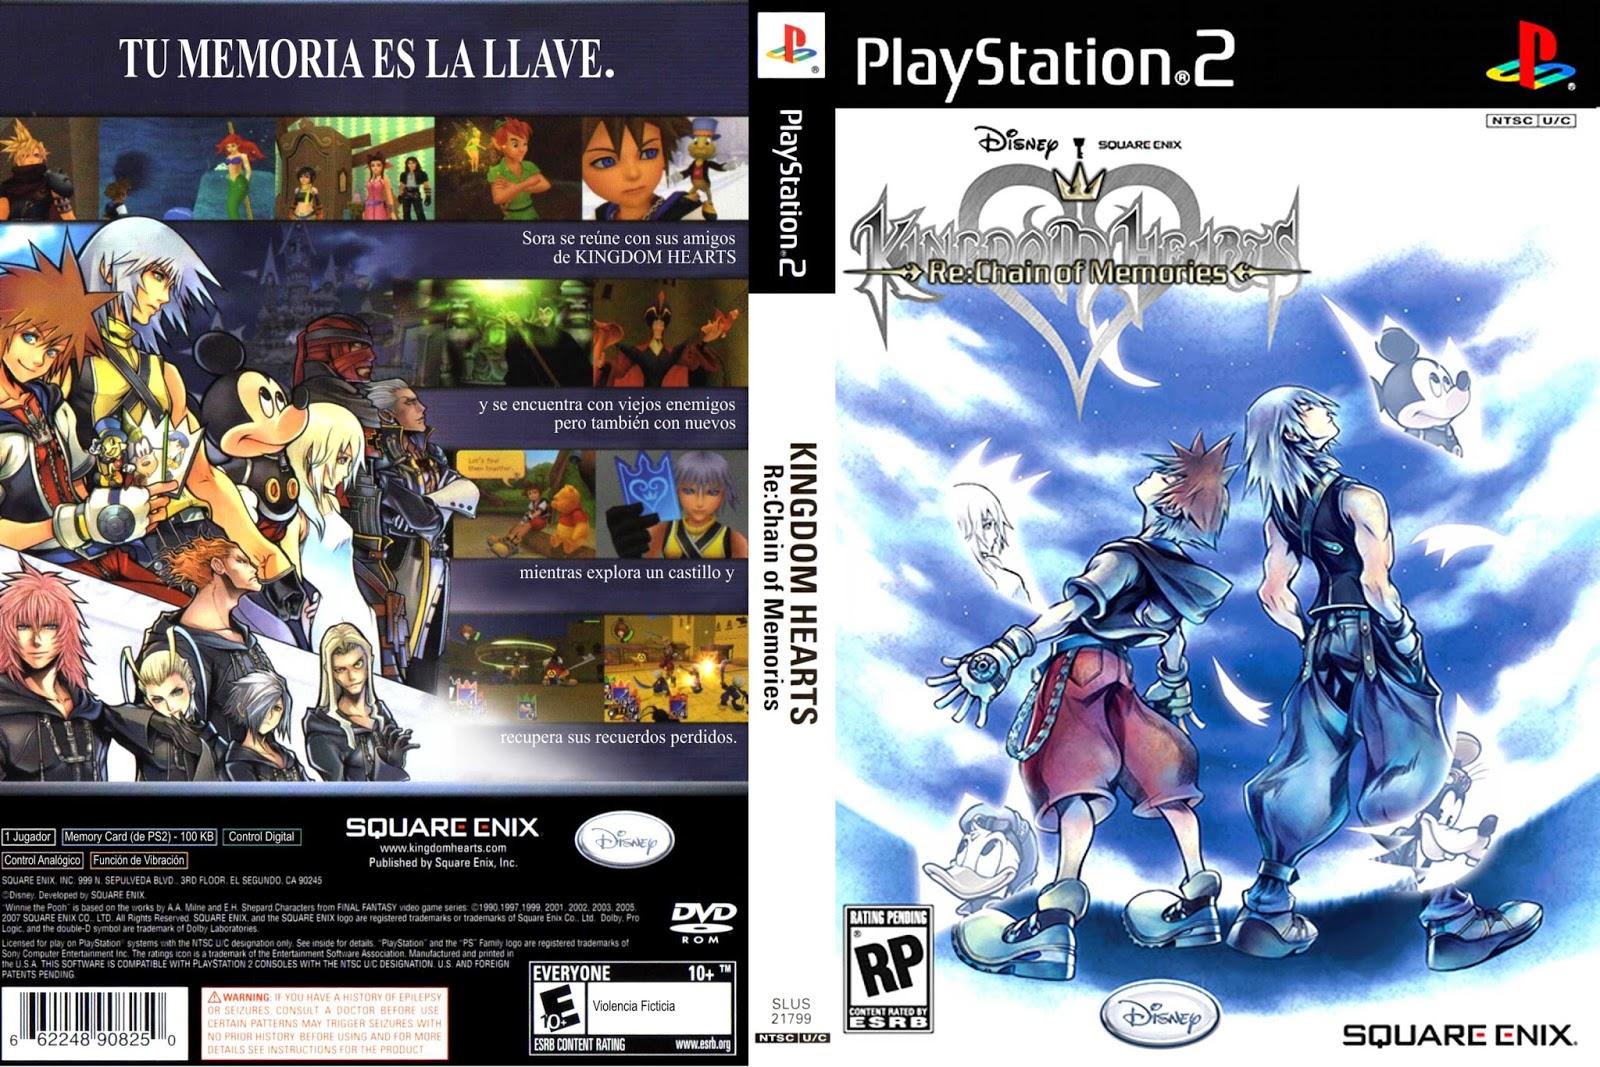 Patch Ita Kingdom Hearts Re Chain Of Memories Ps2 Rom - sevenchild